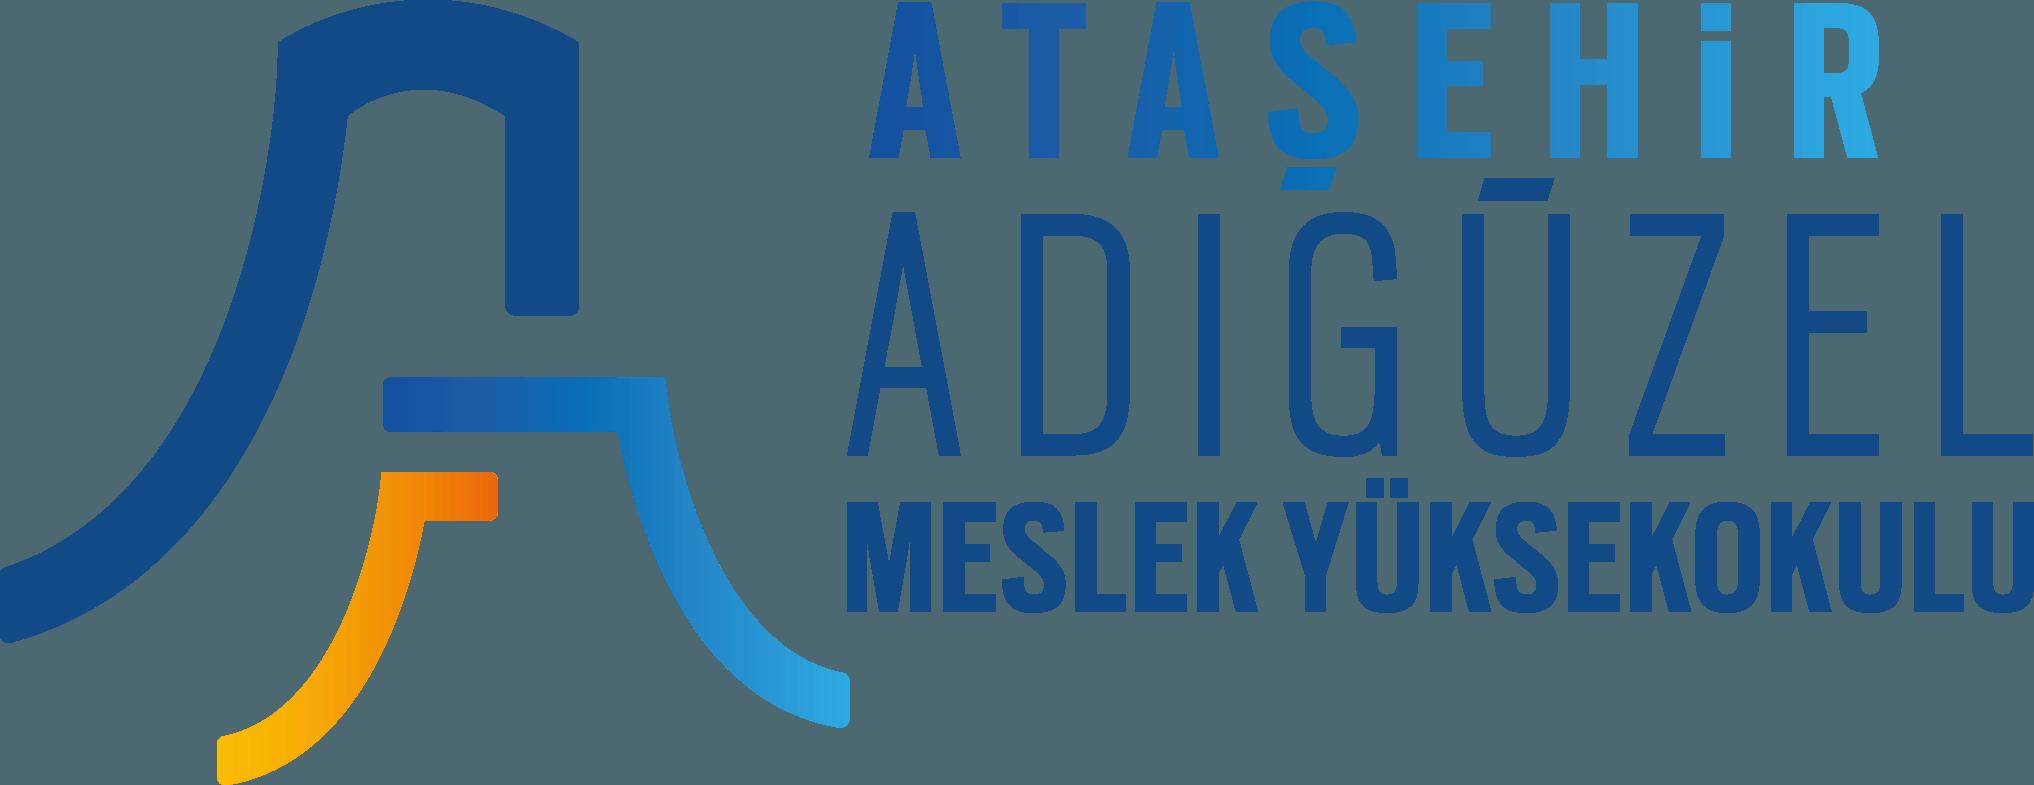 Ataşehir Adıgüzel Meslek Yüksekokulu Logo   Amblem png